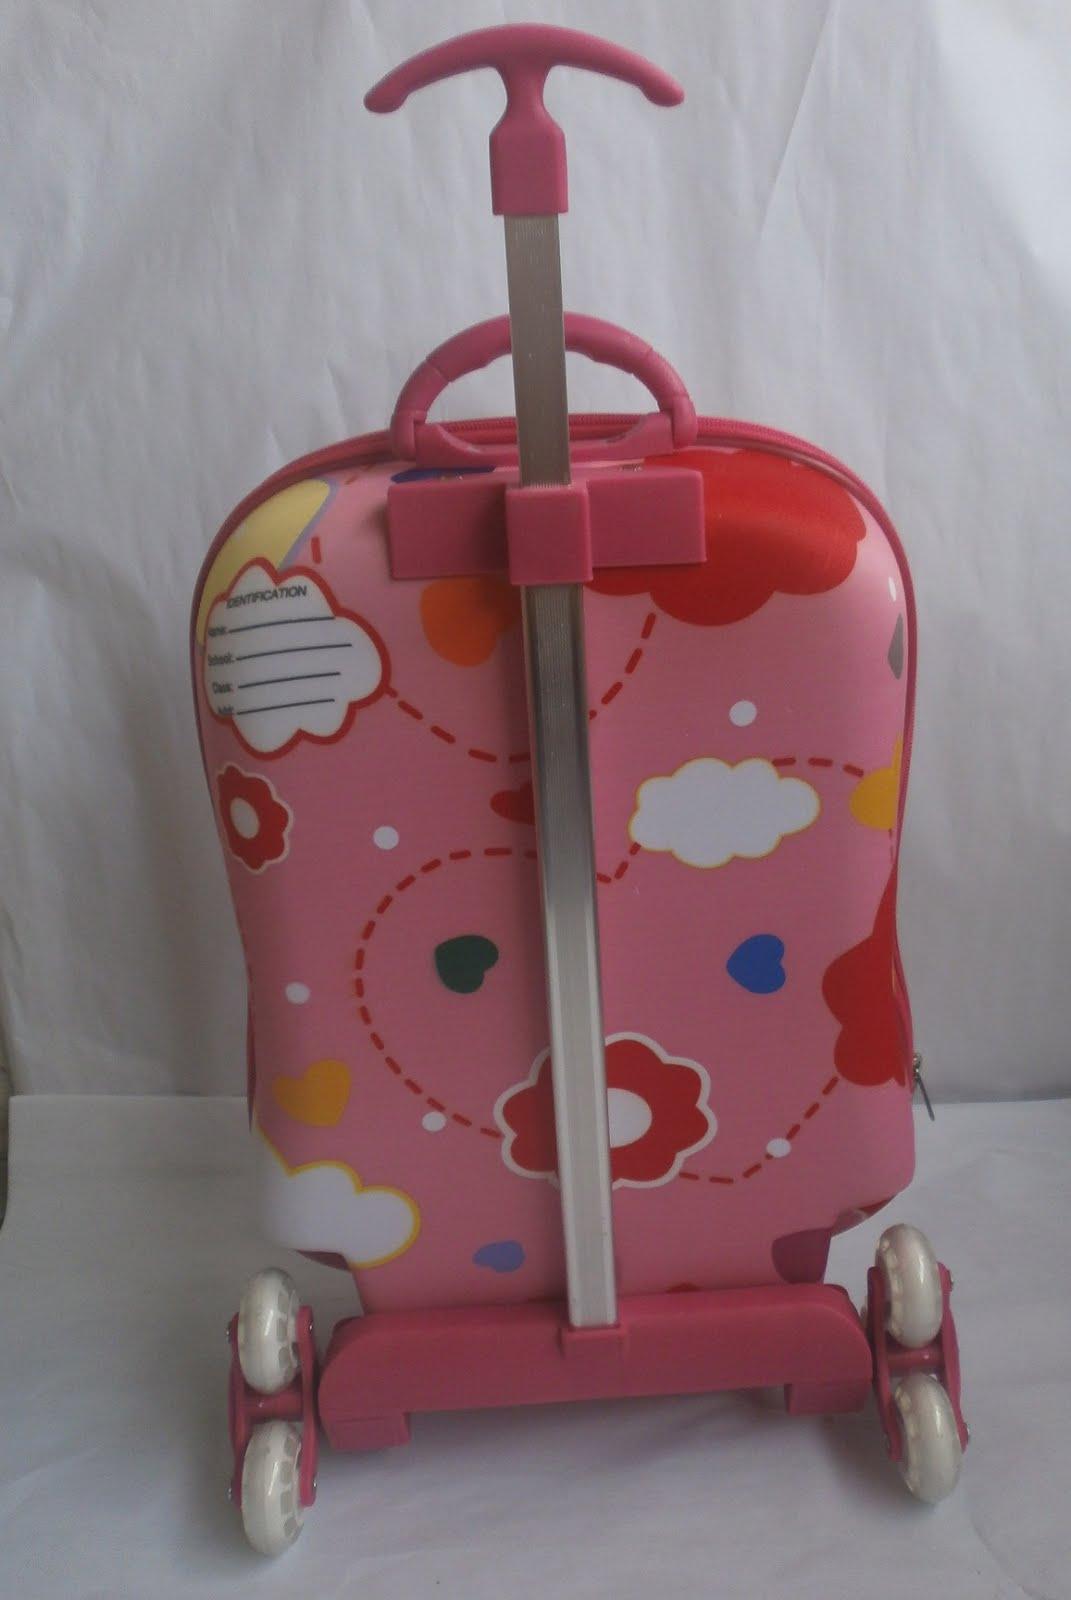 Posh Me Up Sleek Shape Hello Kitty Trolley Bag Sold Out